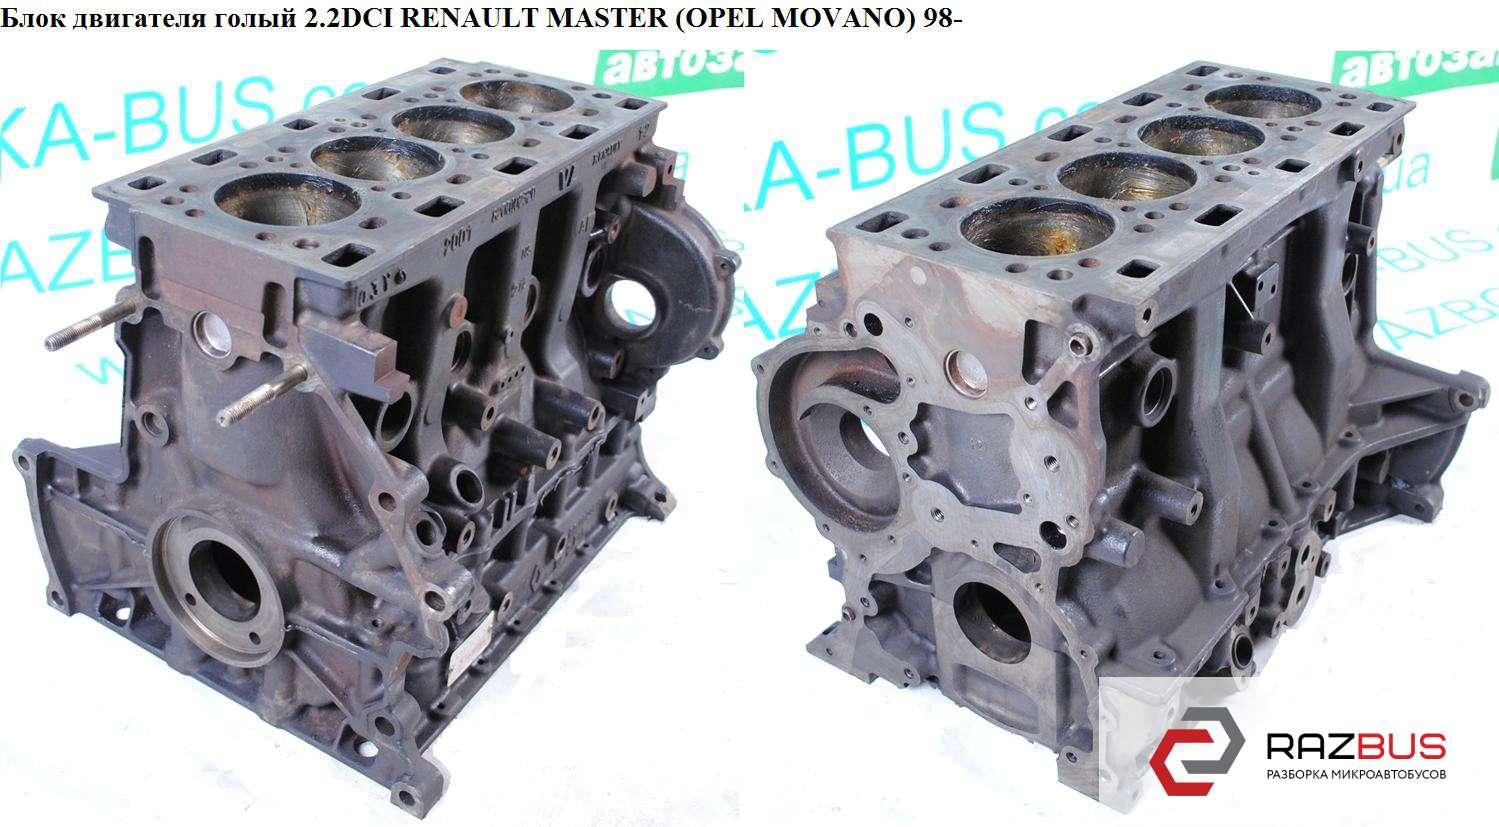 G9T 720, G9T720 Блок двигателя голый 2.2DCI NISSAN INTERSTAR 2003-2010г